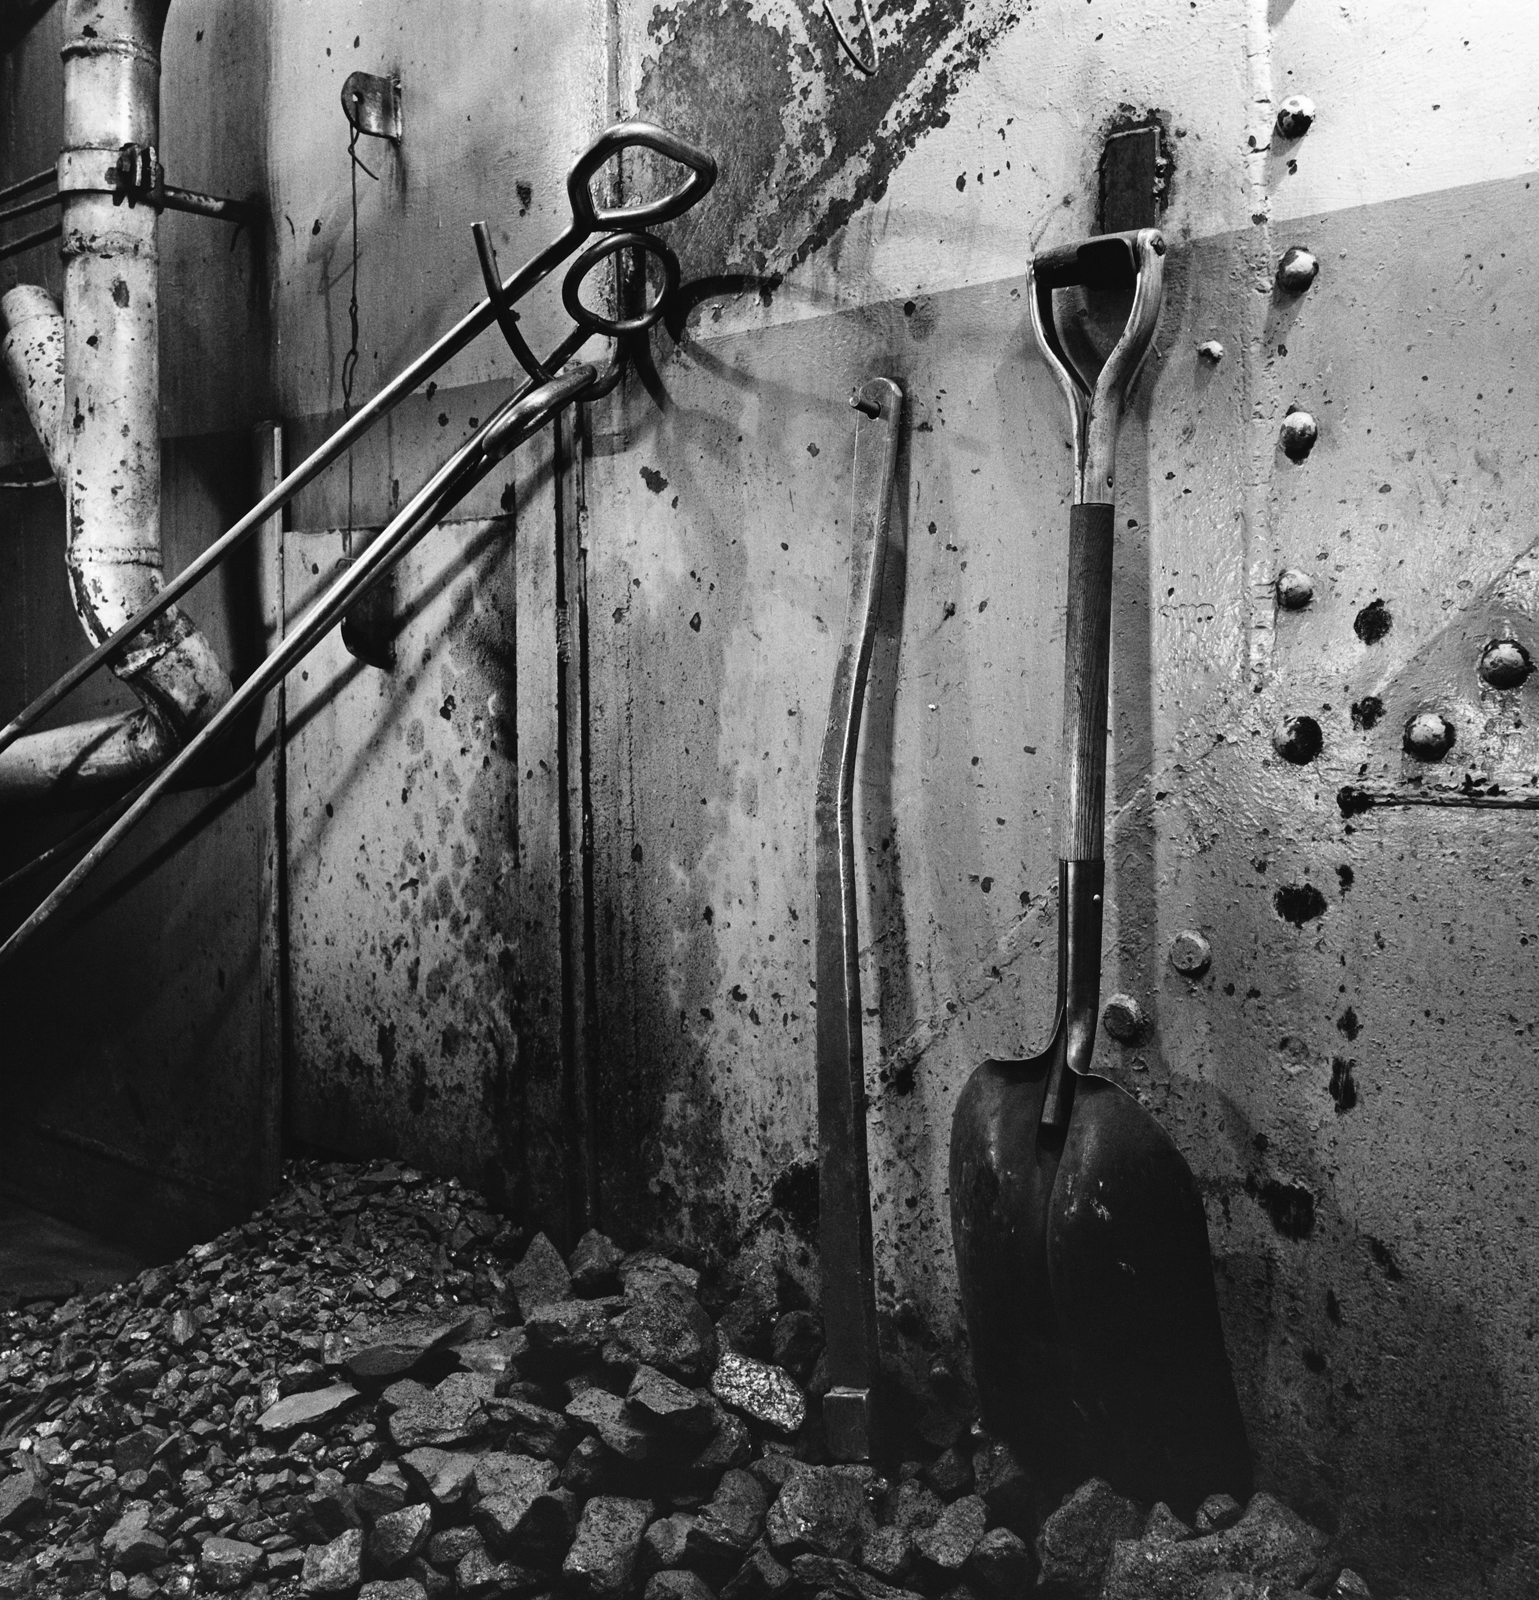 Firehold, Steamer Irvin L. Clymer, 1990 (CWS)